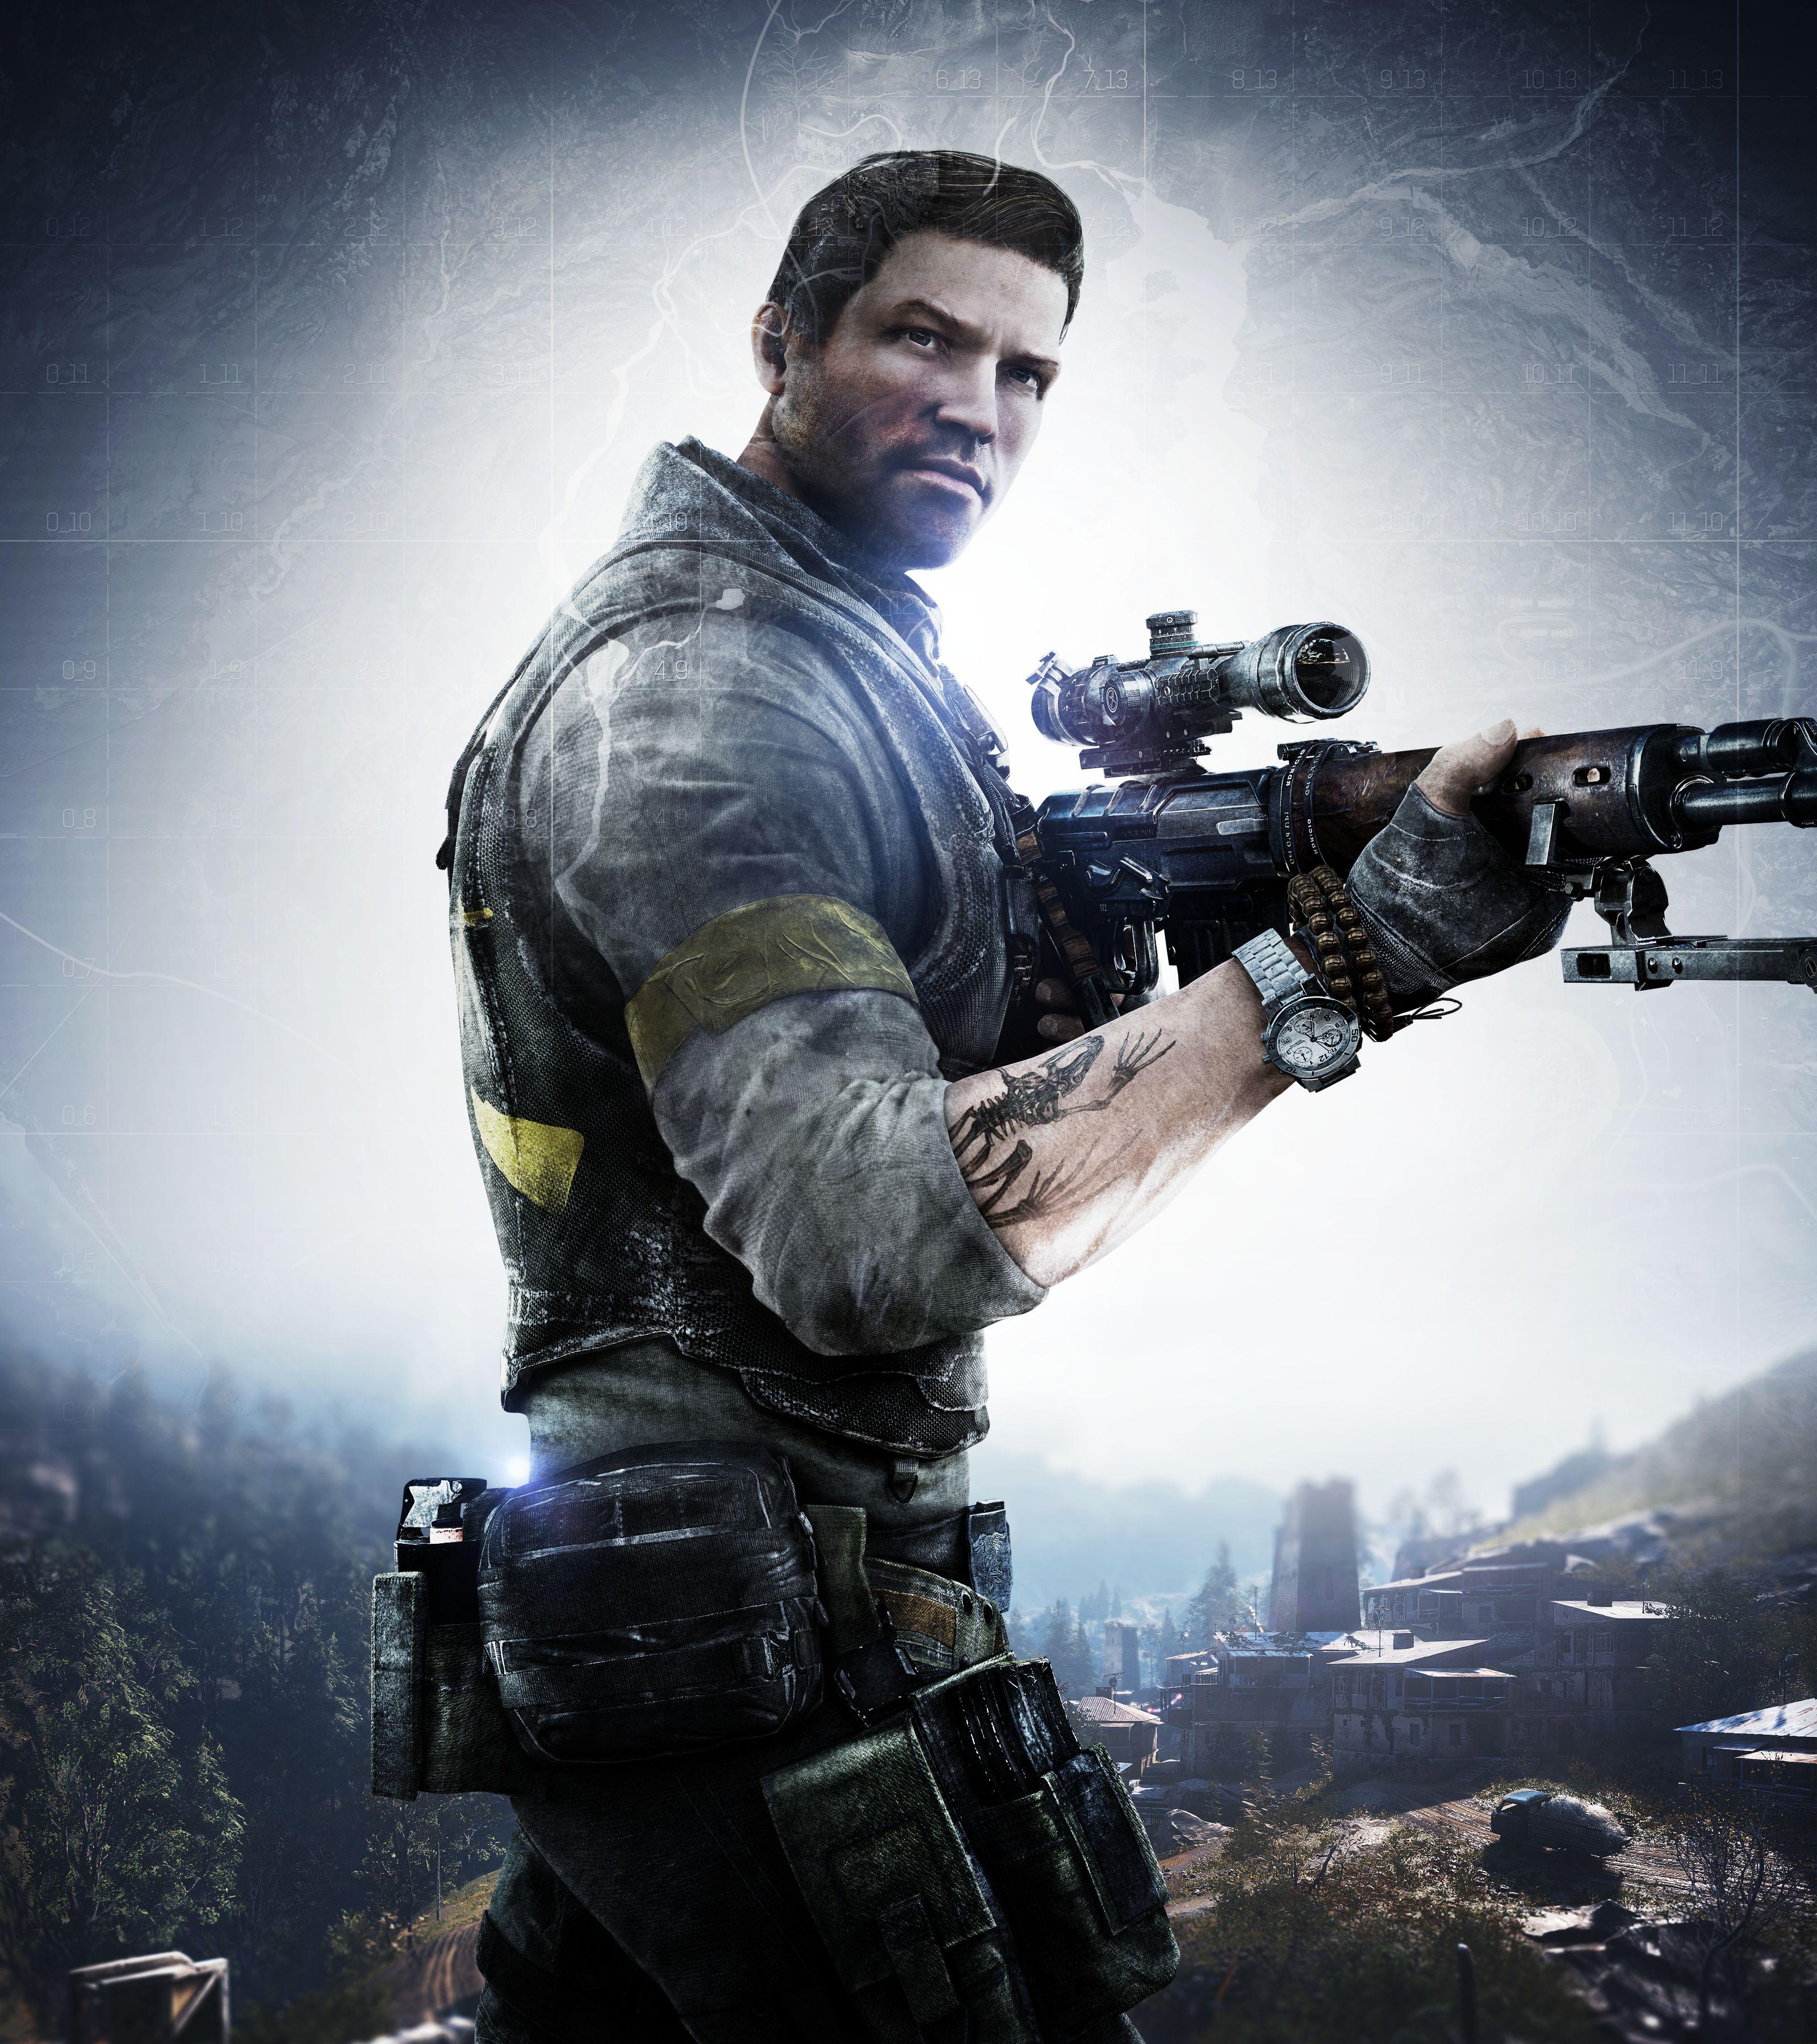 Detaily o příběhu Sniper: Ghost Warrior 3 136841